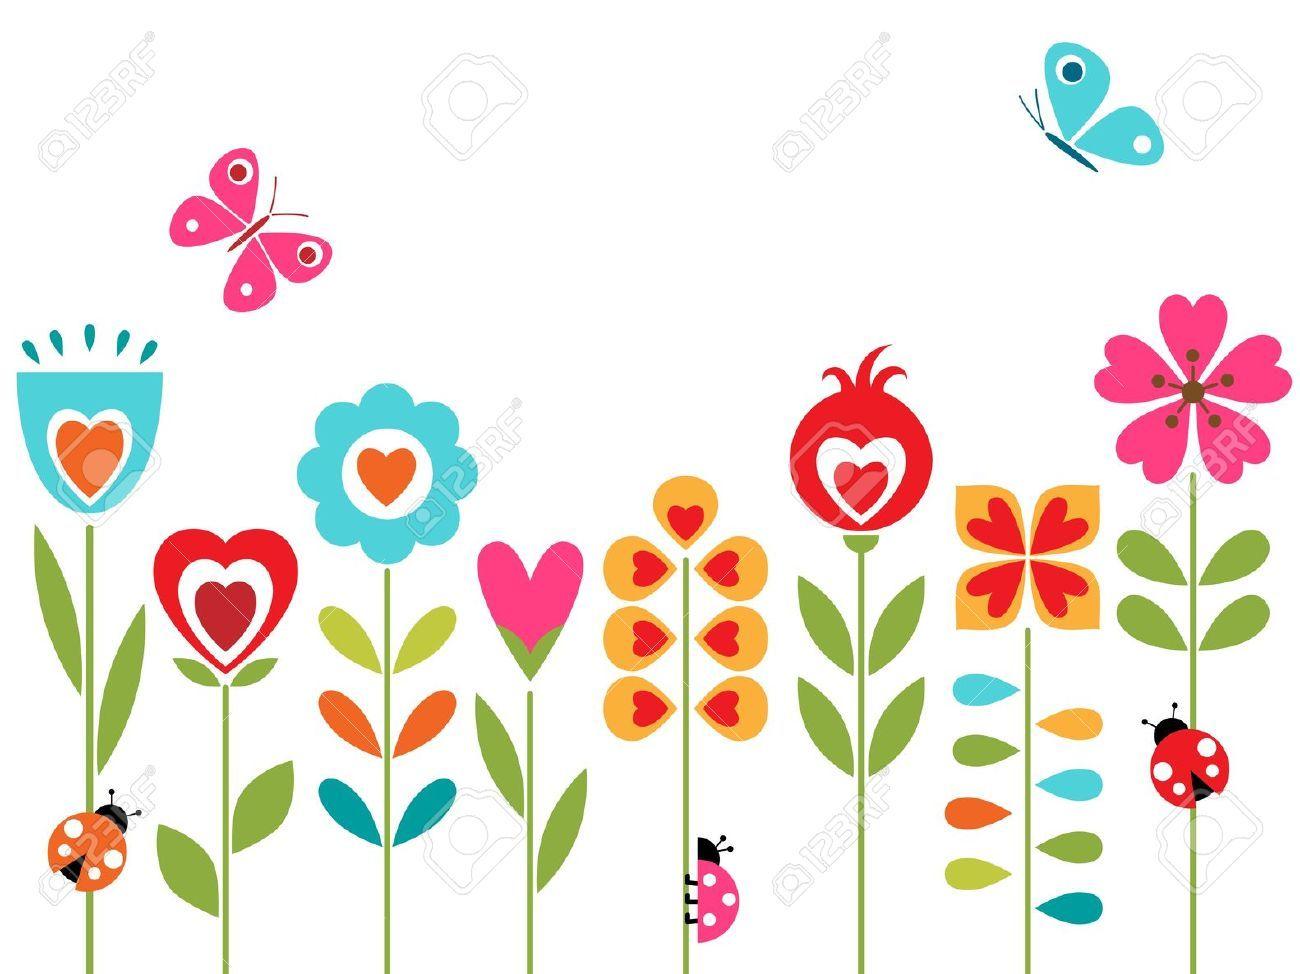 Flowers cartoon images ClipartFest Socks Pinterest